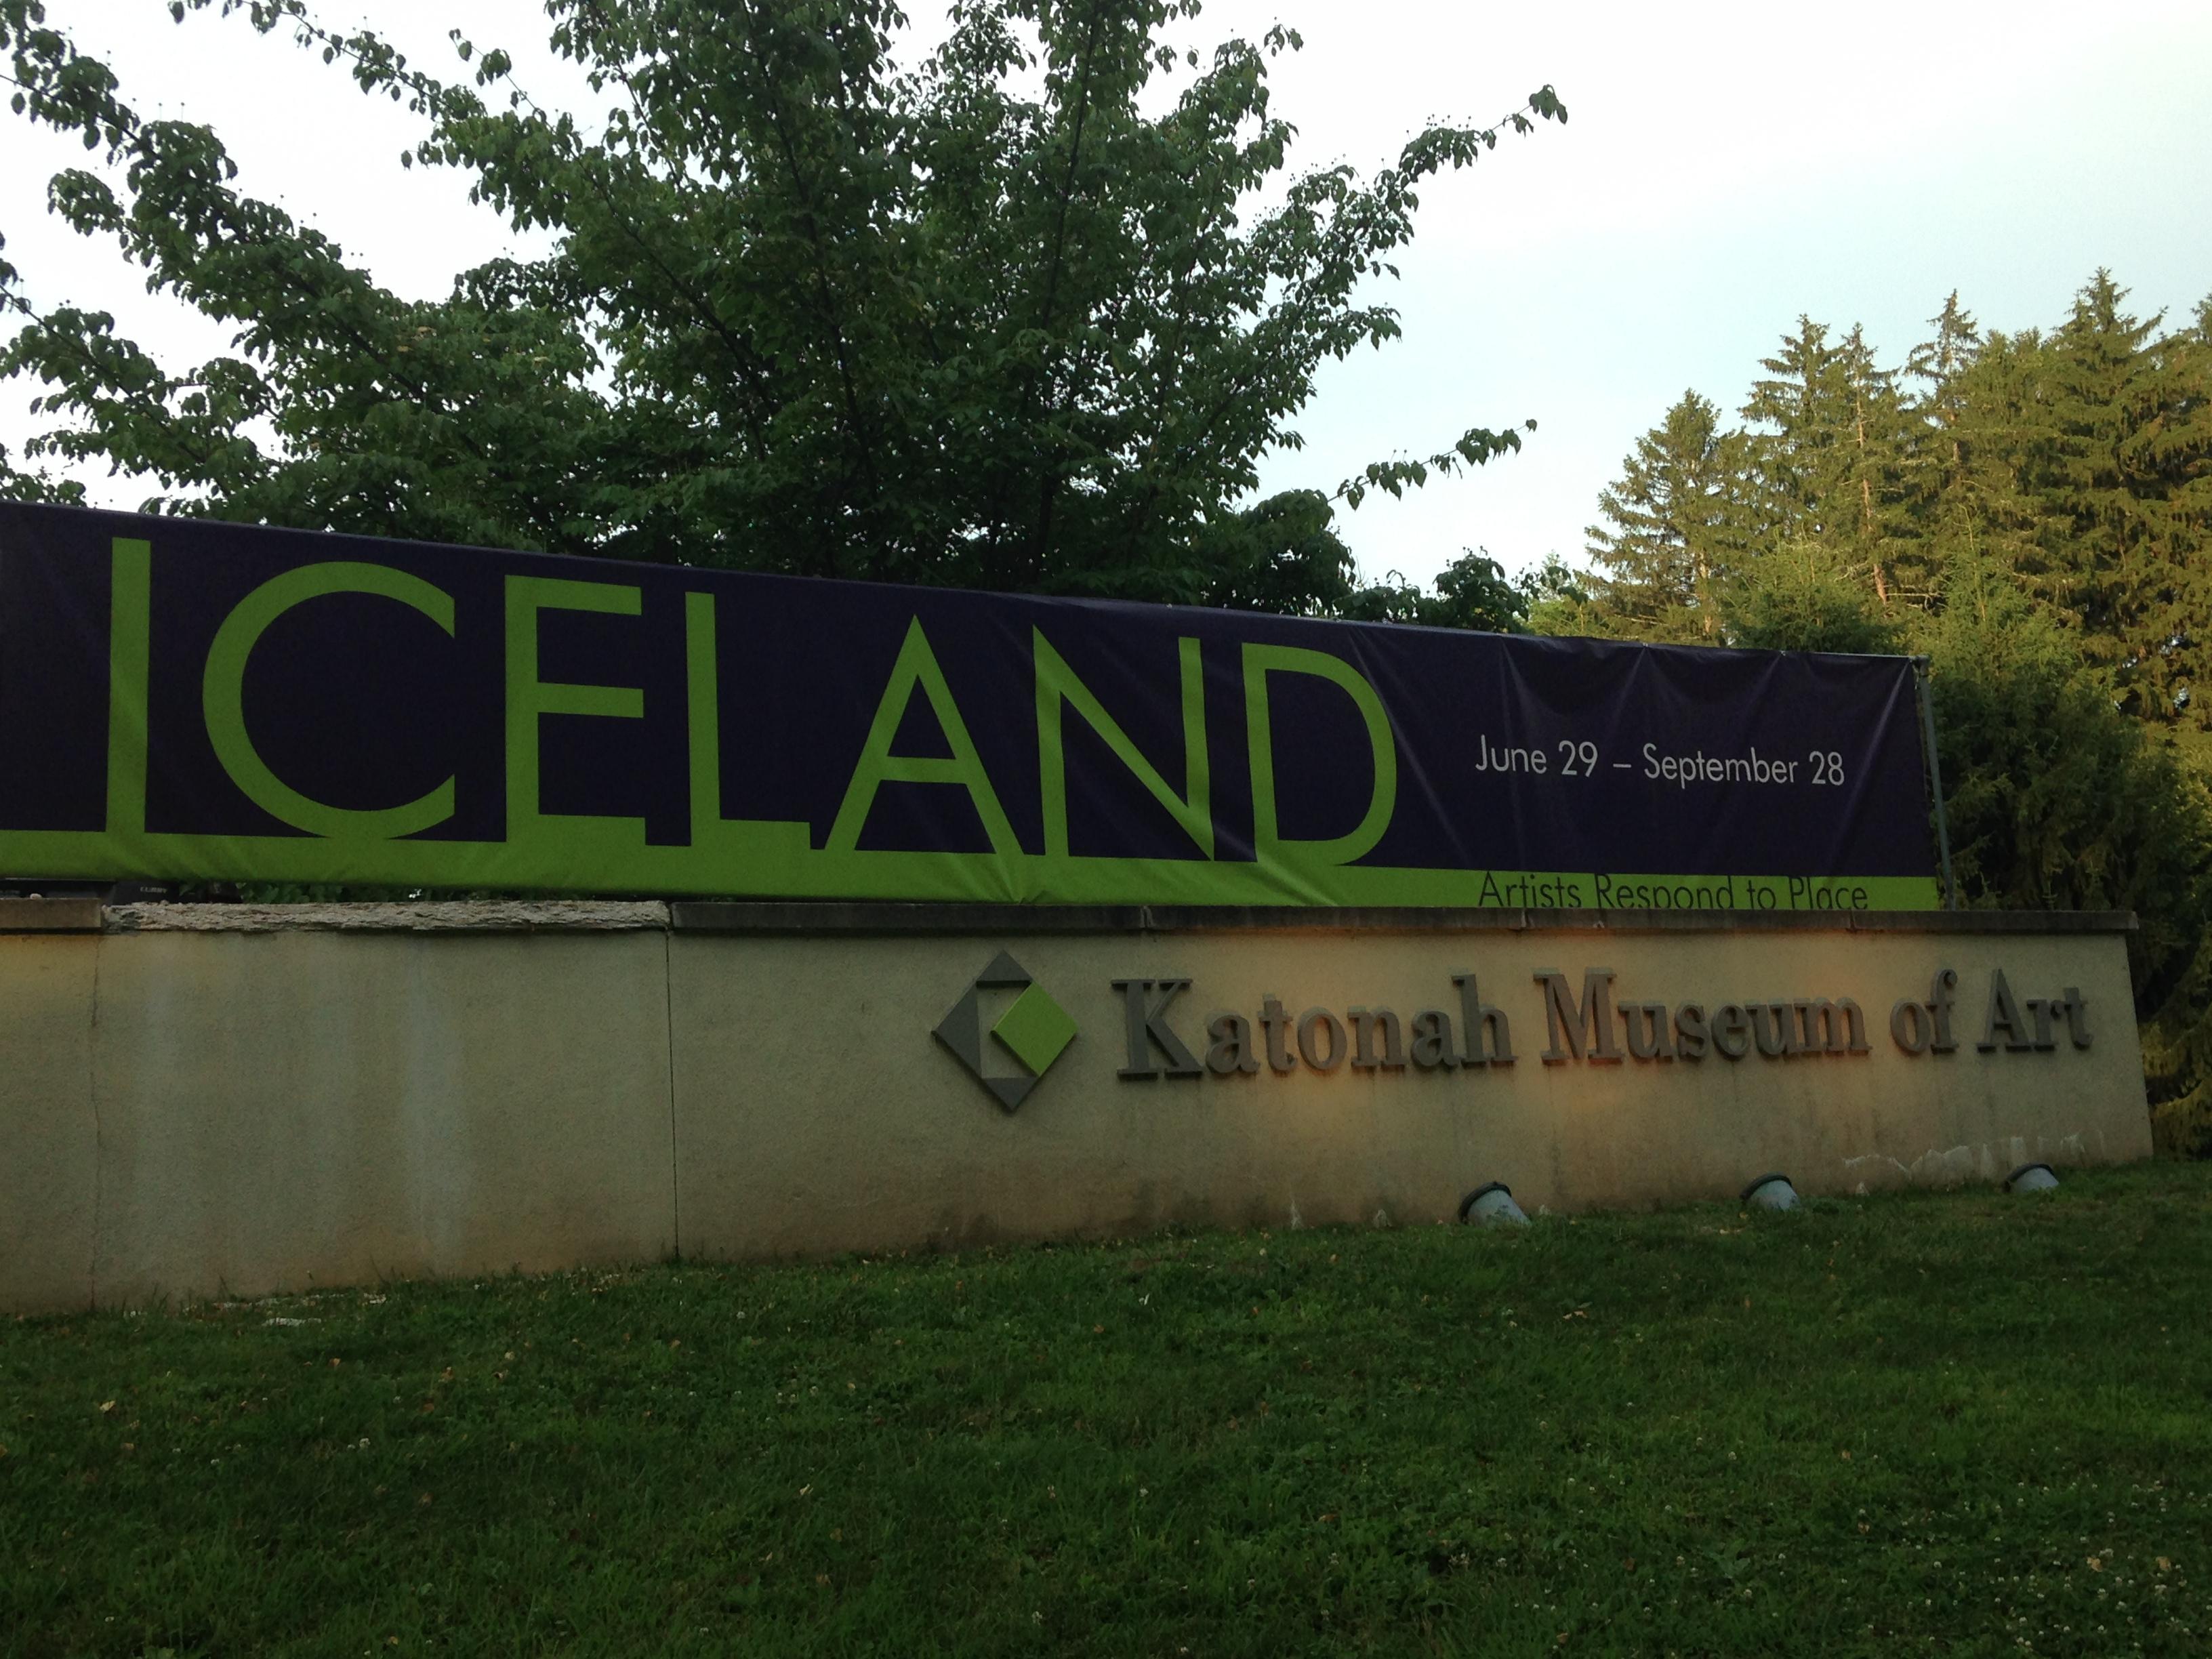 Katonah-Museum-of-Art-Iceland-sign.jpg